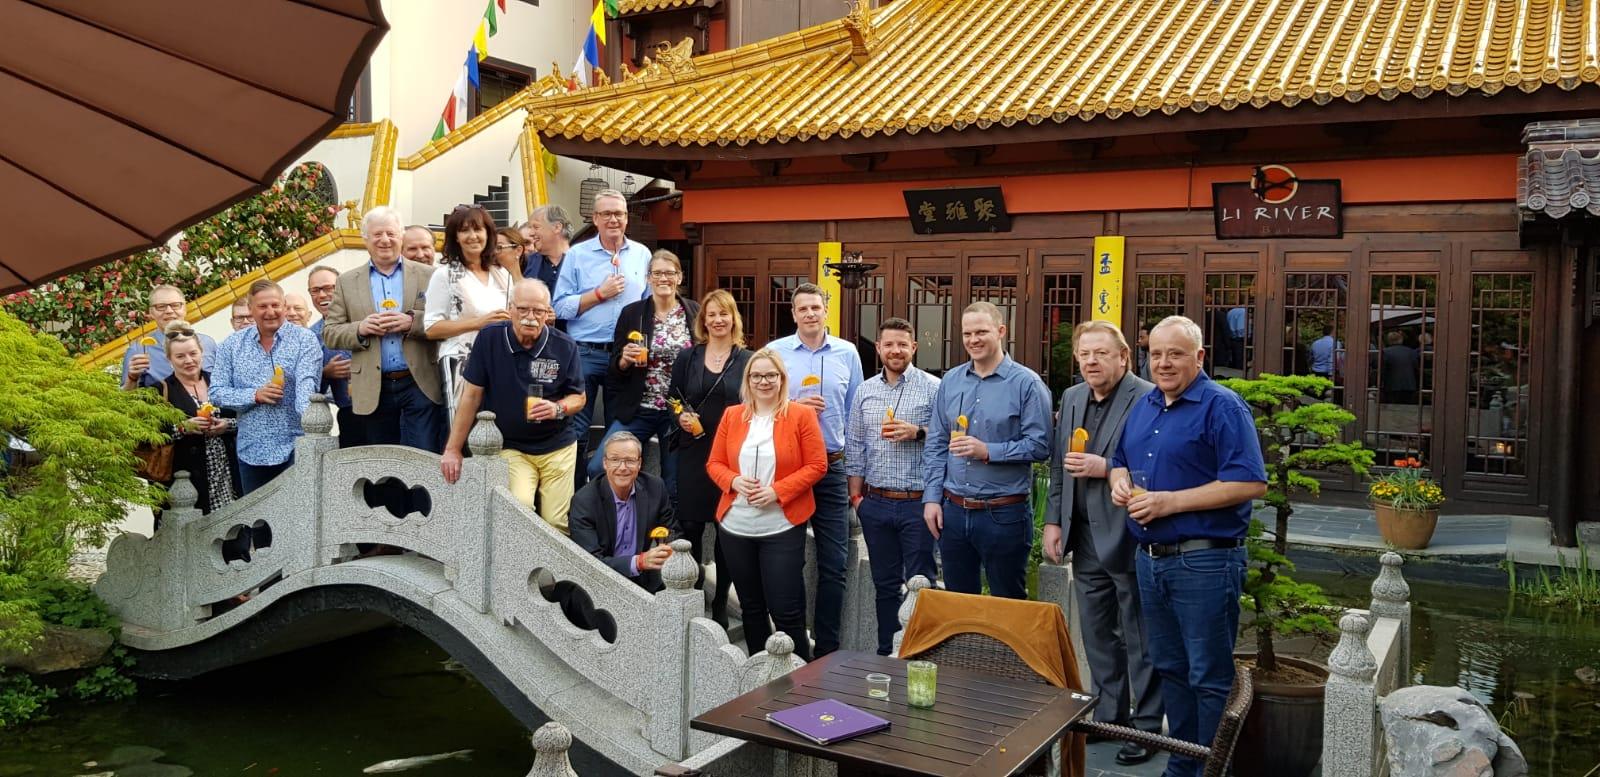 Solvotrin Therapeutics and Roha APD new partnership poised to invigorate the German oral iron market